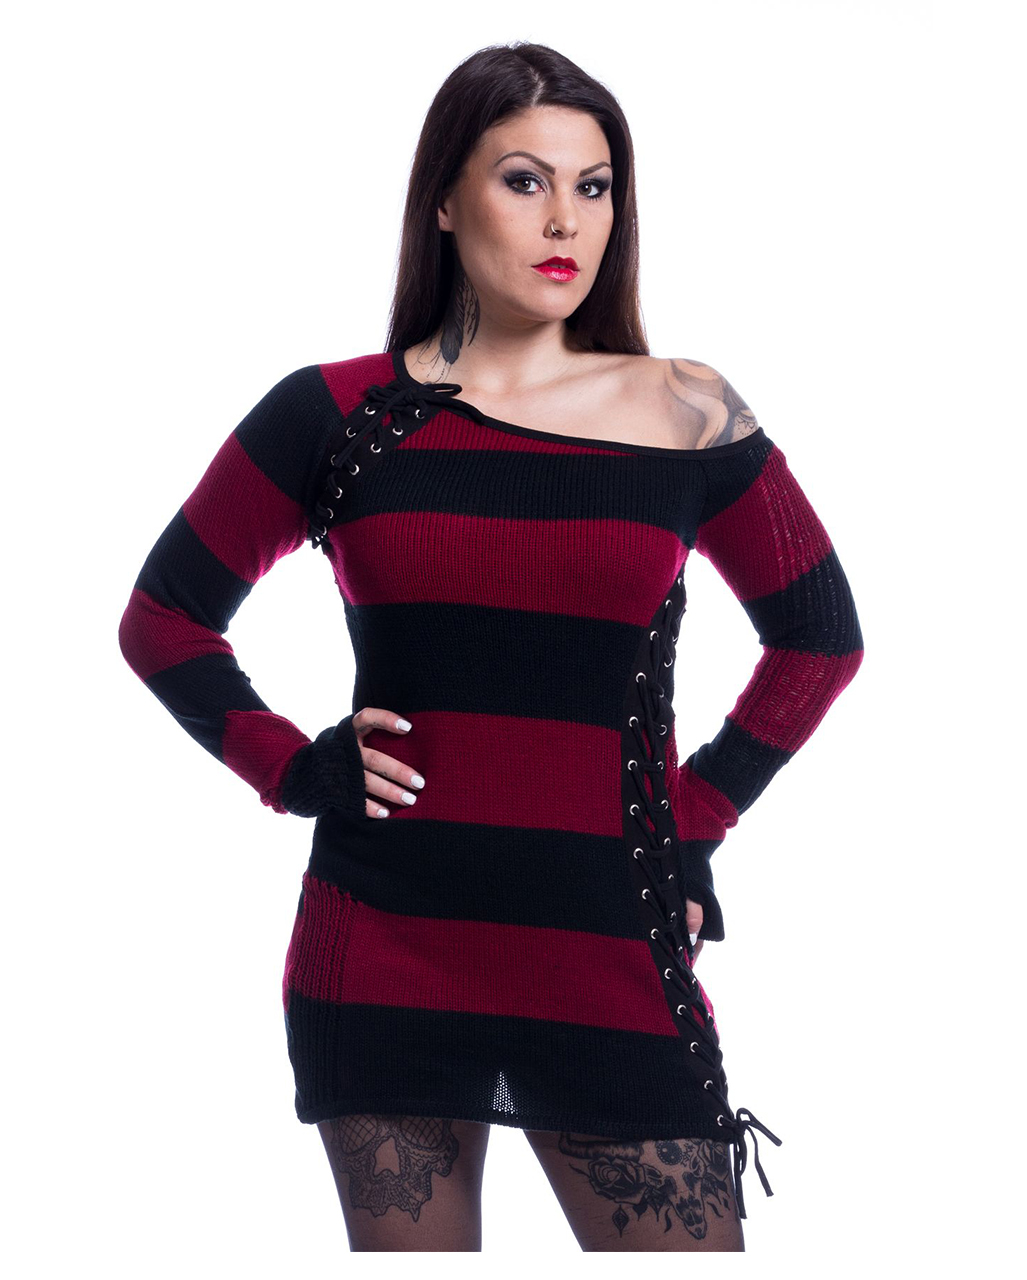 superior quality 2b081 42595 Alley Gothic Pullover Schwarz Rot